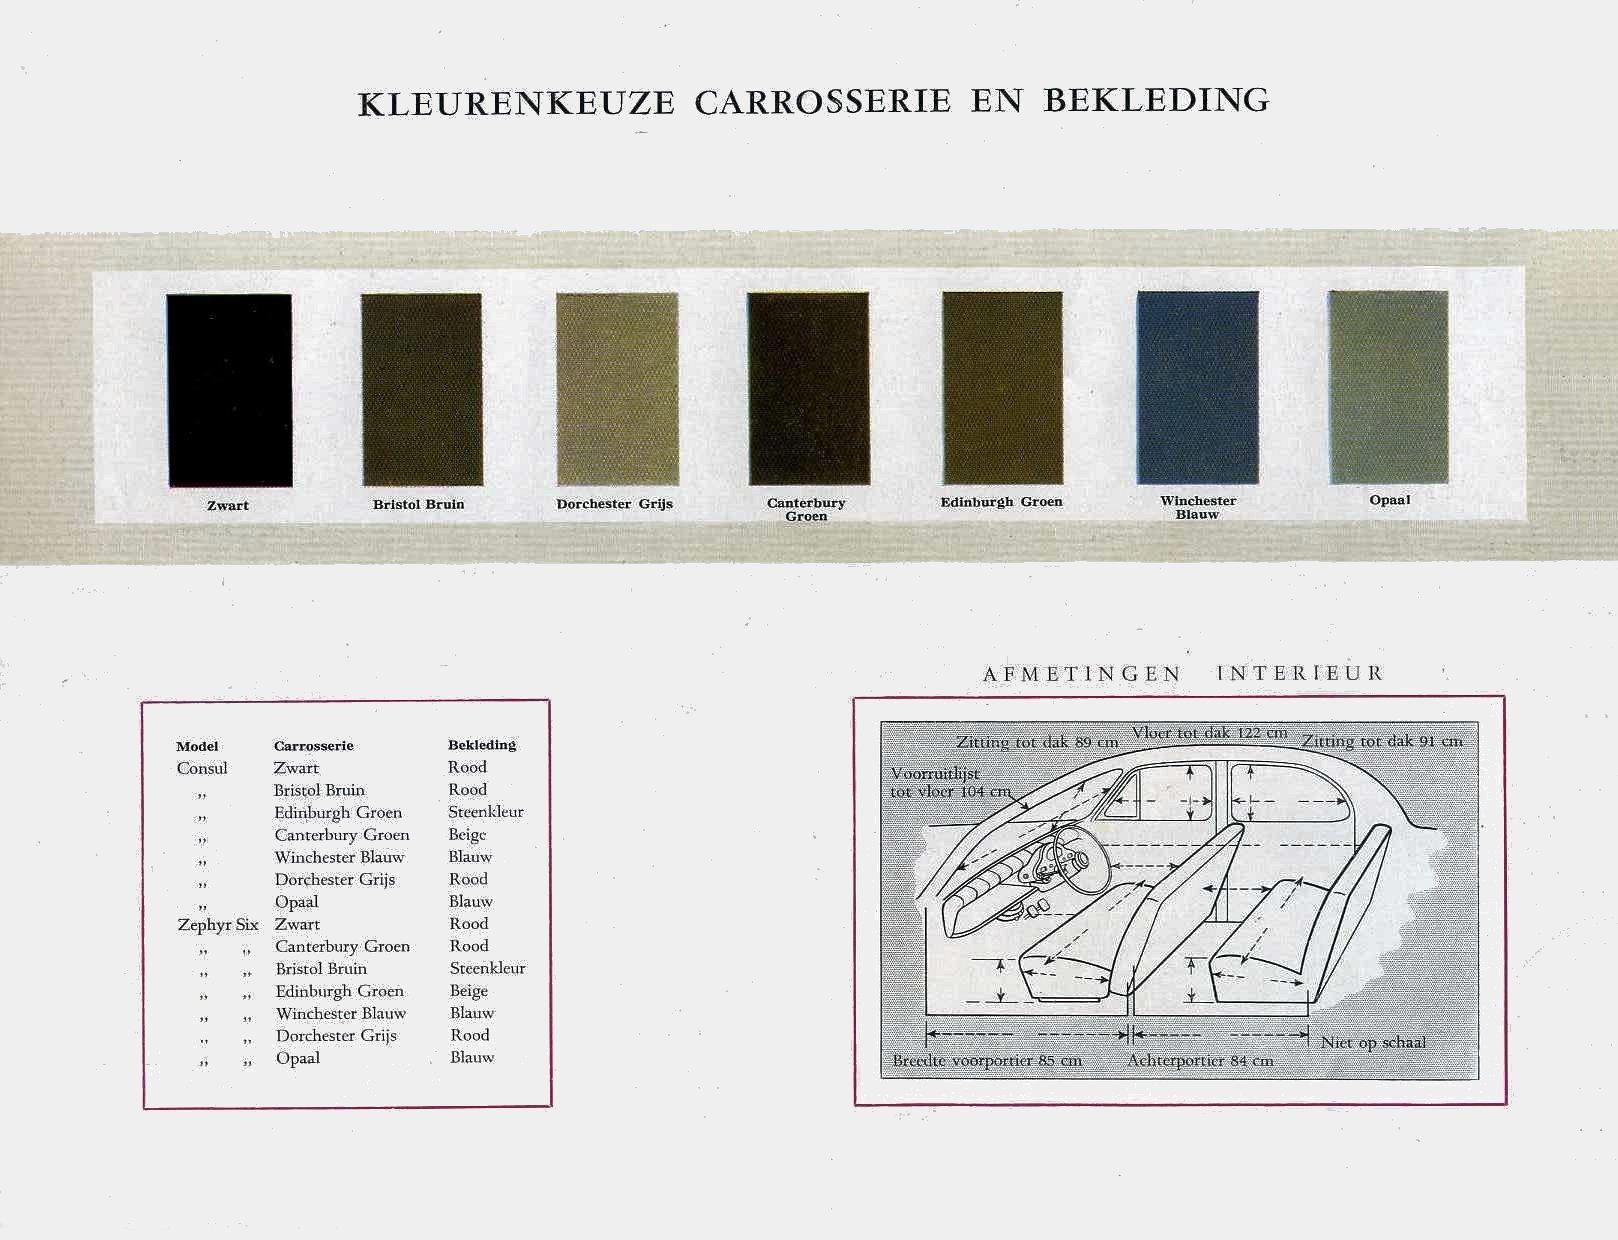 Car Color Chart >> 1954 Ford Zephyr Consul Six brochure